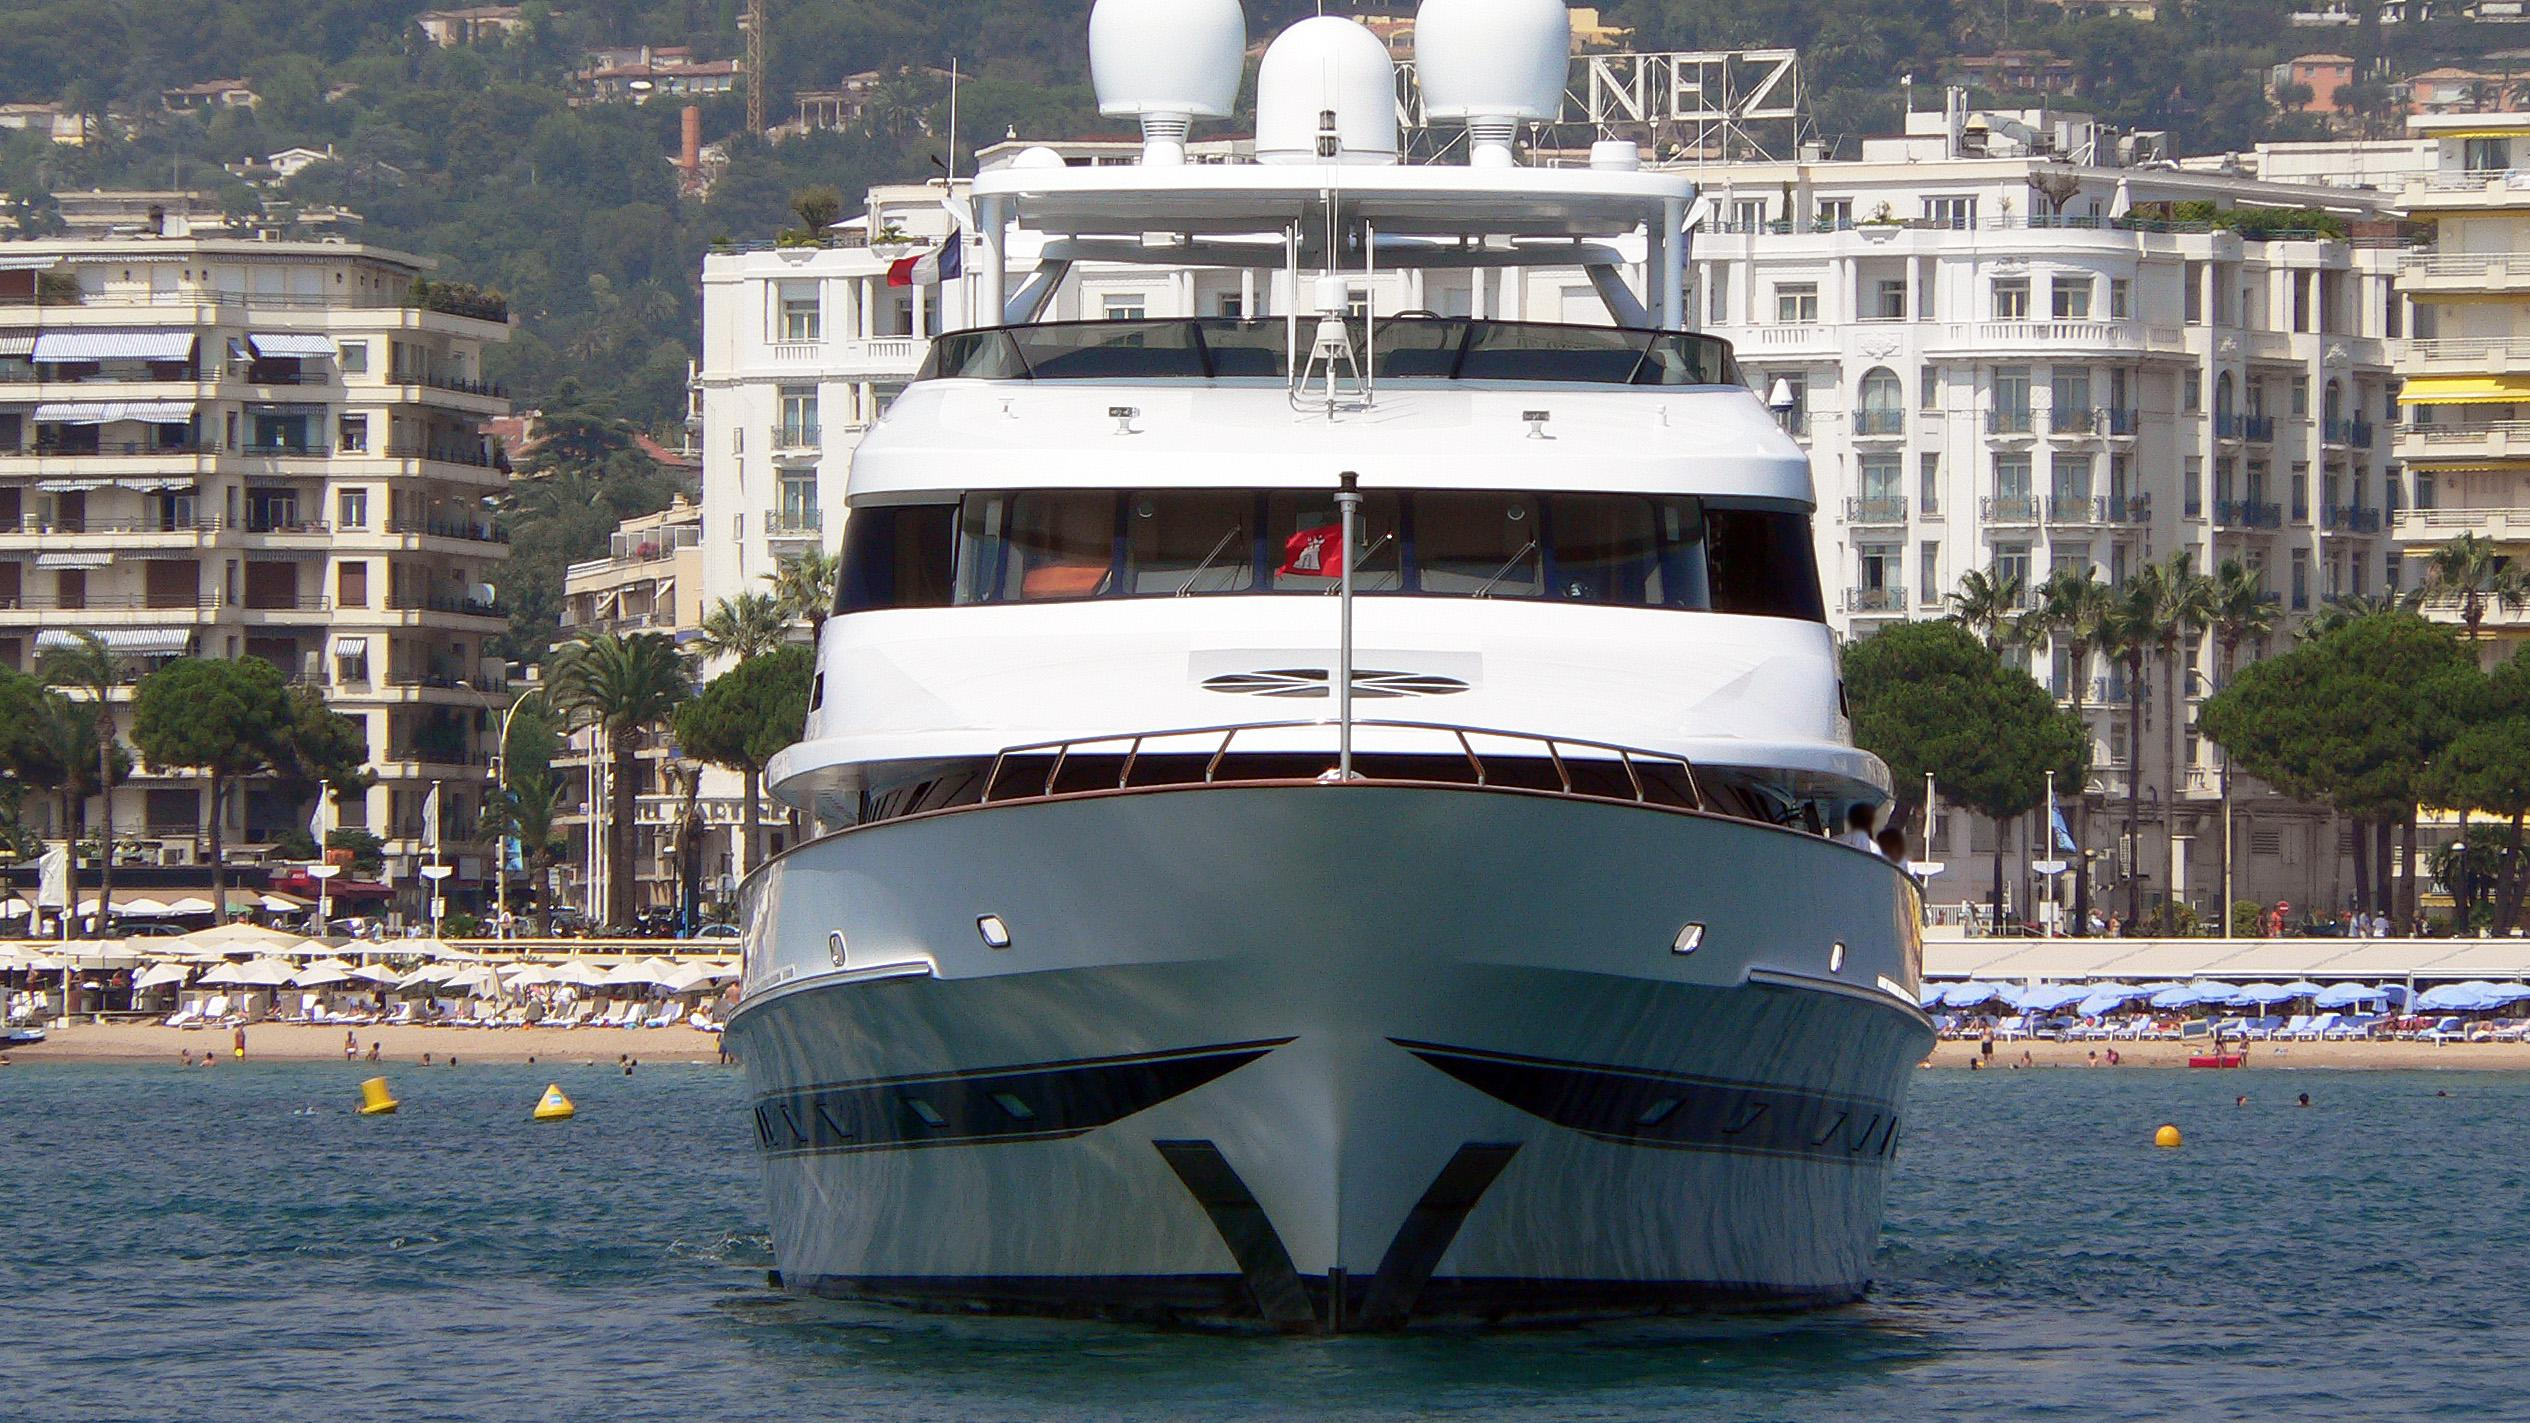 ontario-motor-yacht-lurssen-1992-46m-bow